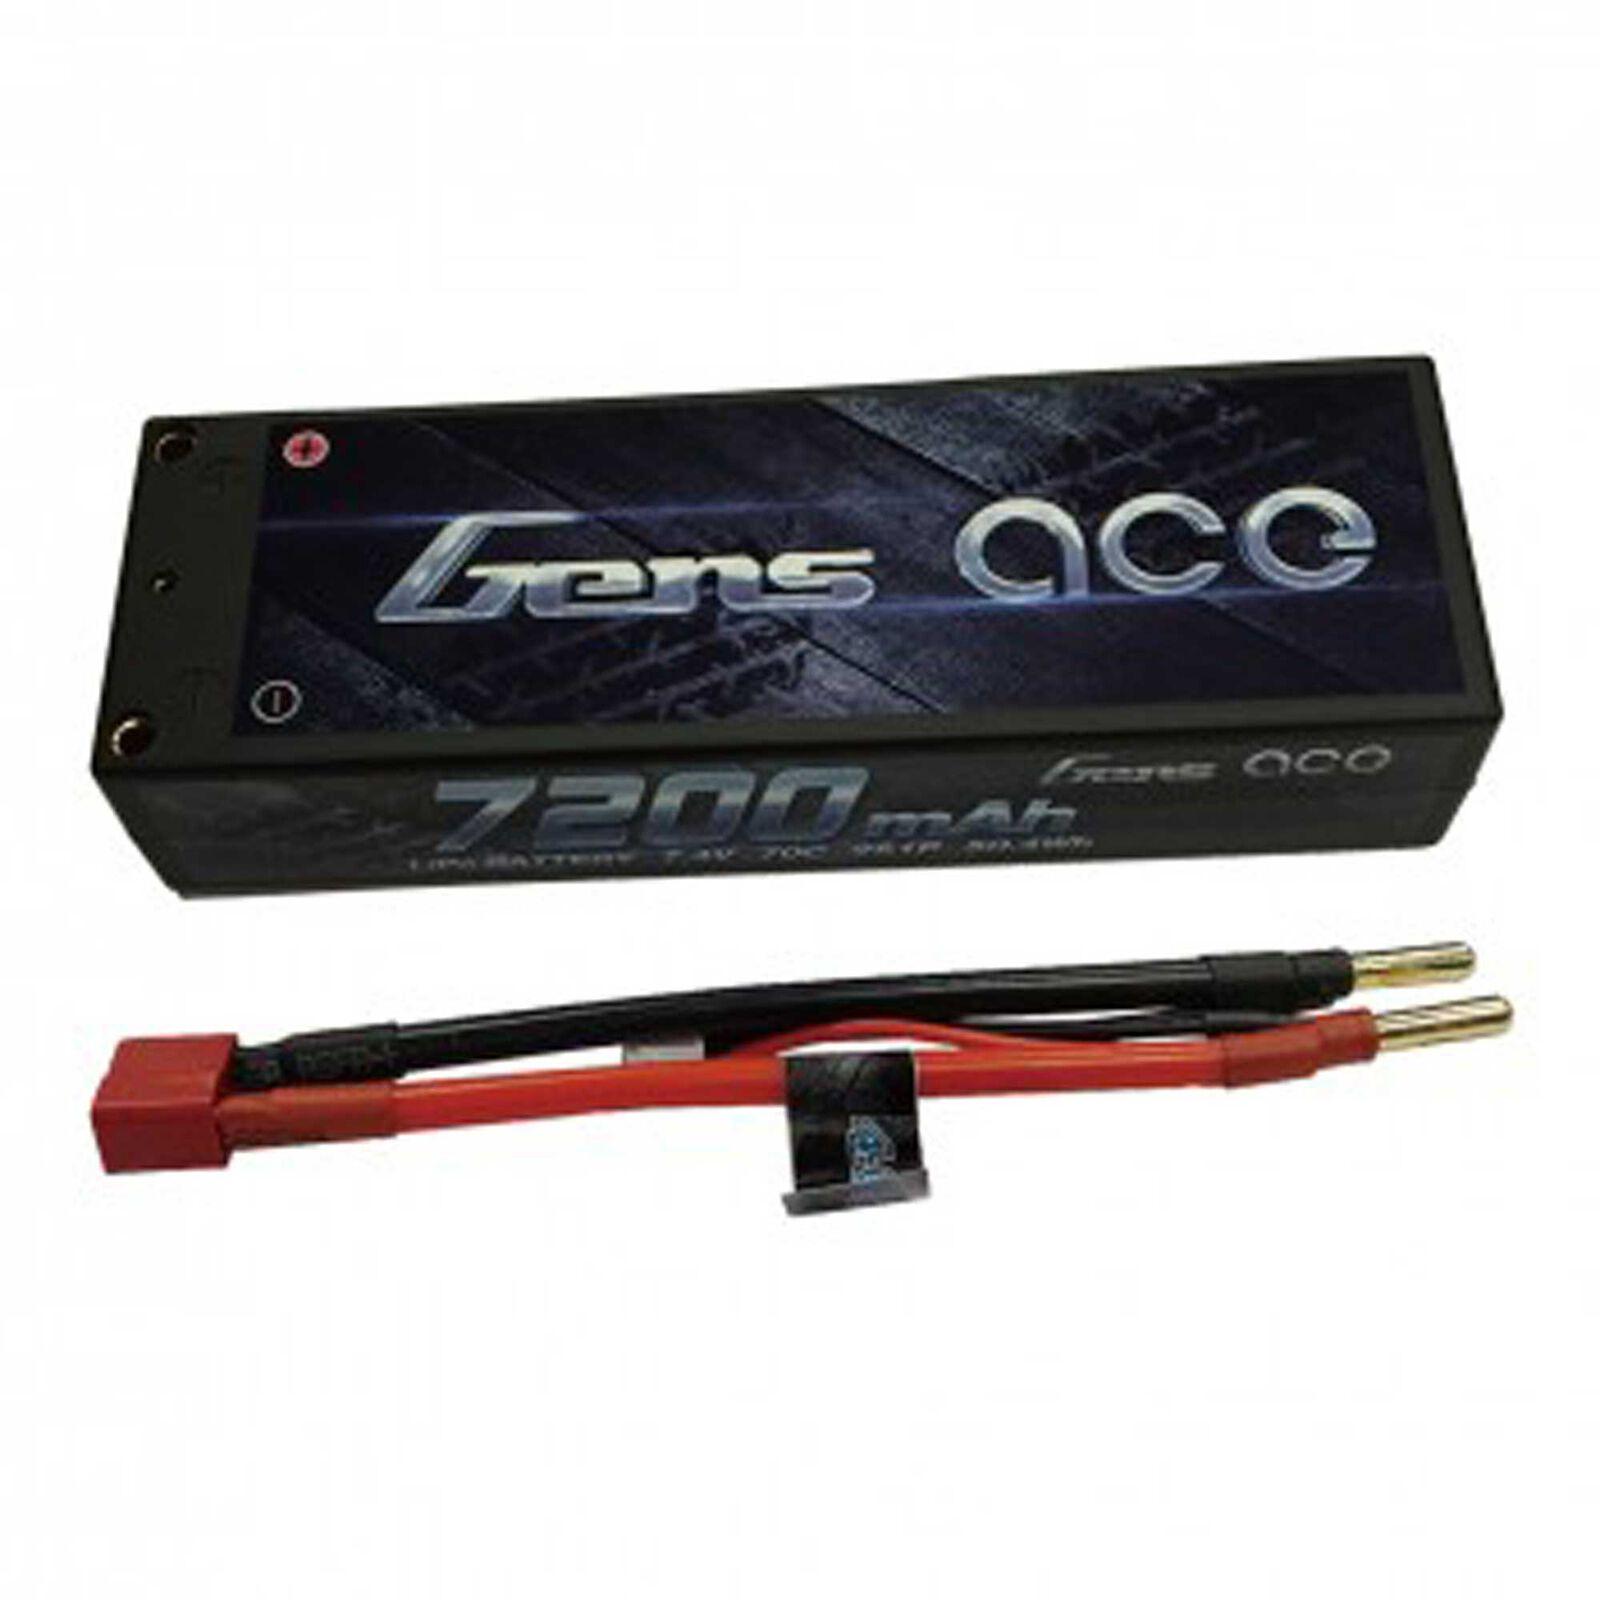 7.4V 7200 Capacity 2S Voltage 70C LiPo, Deans